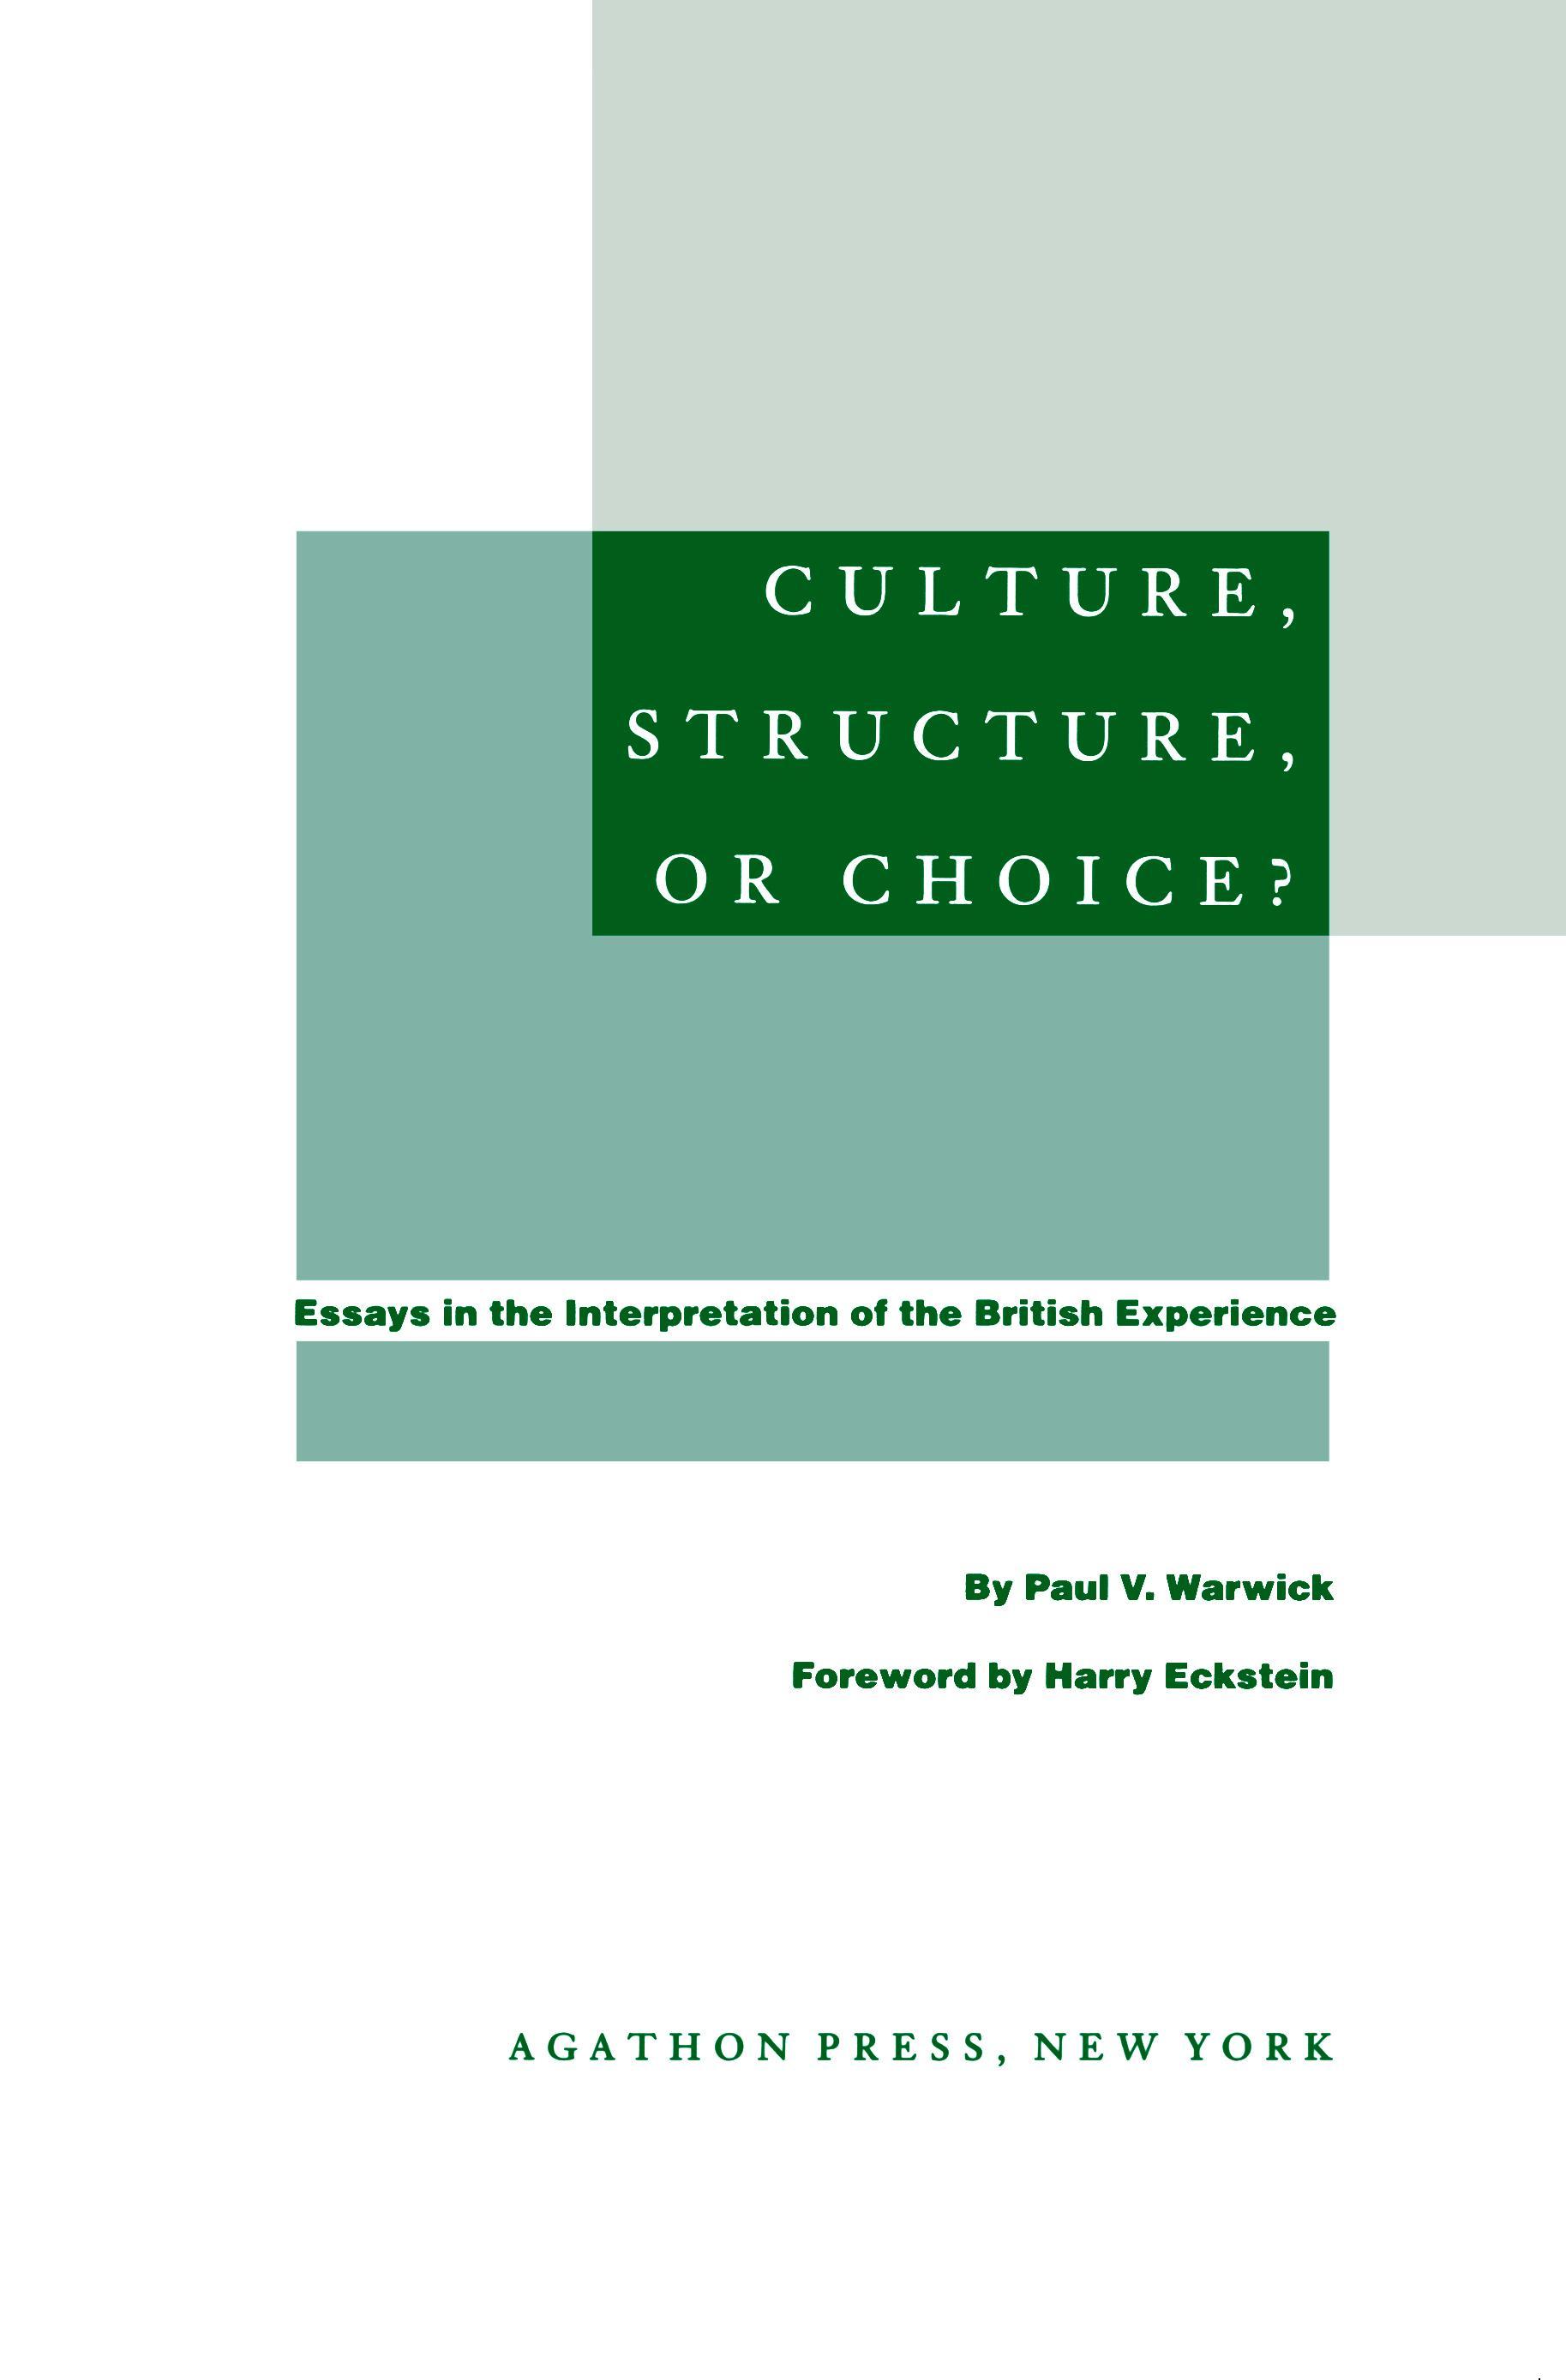 Culture, Structure, or Choice? (ebook) EB9780875862712